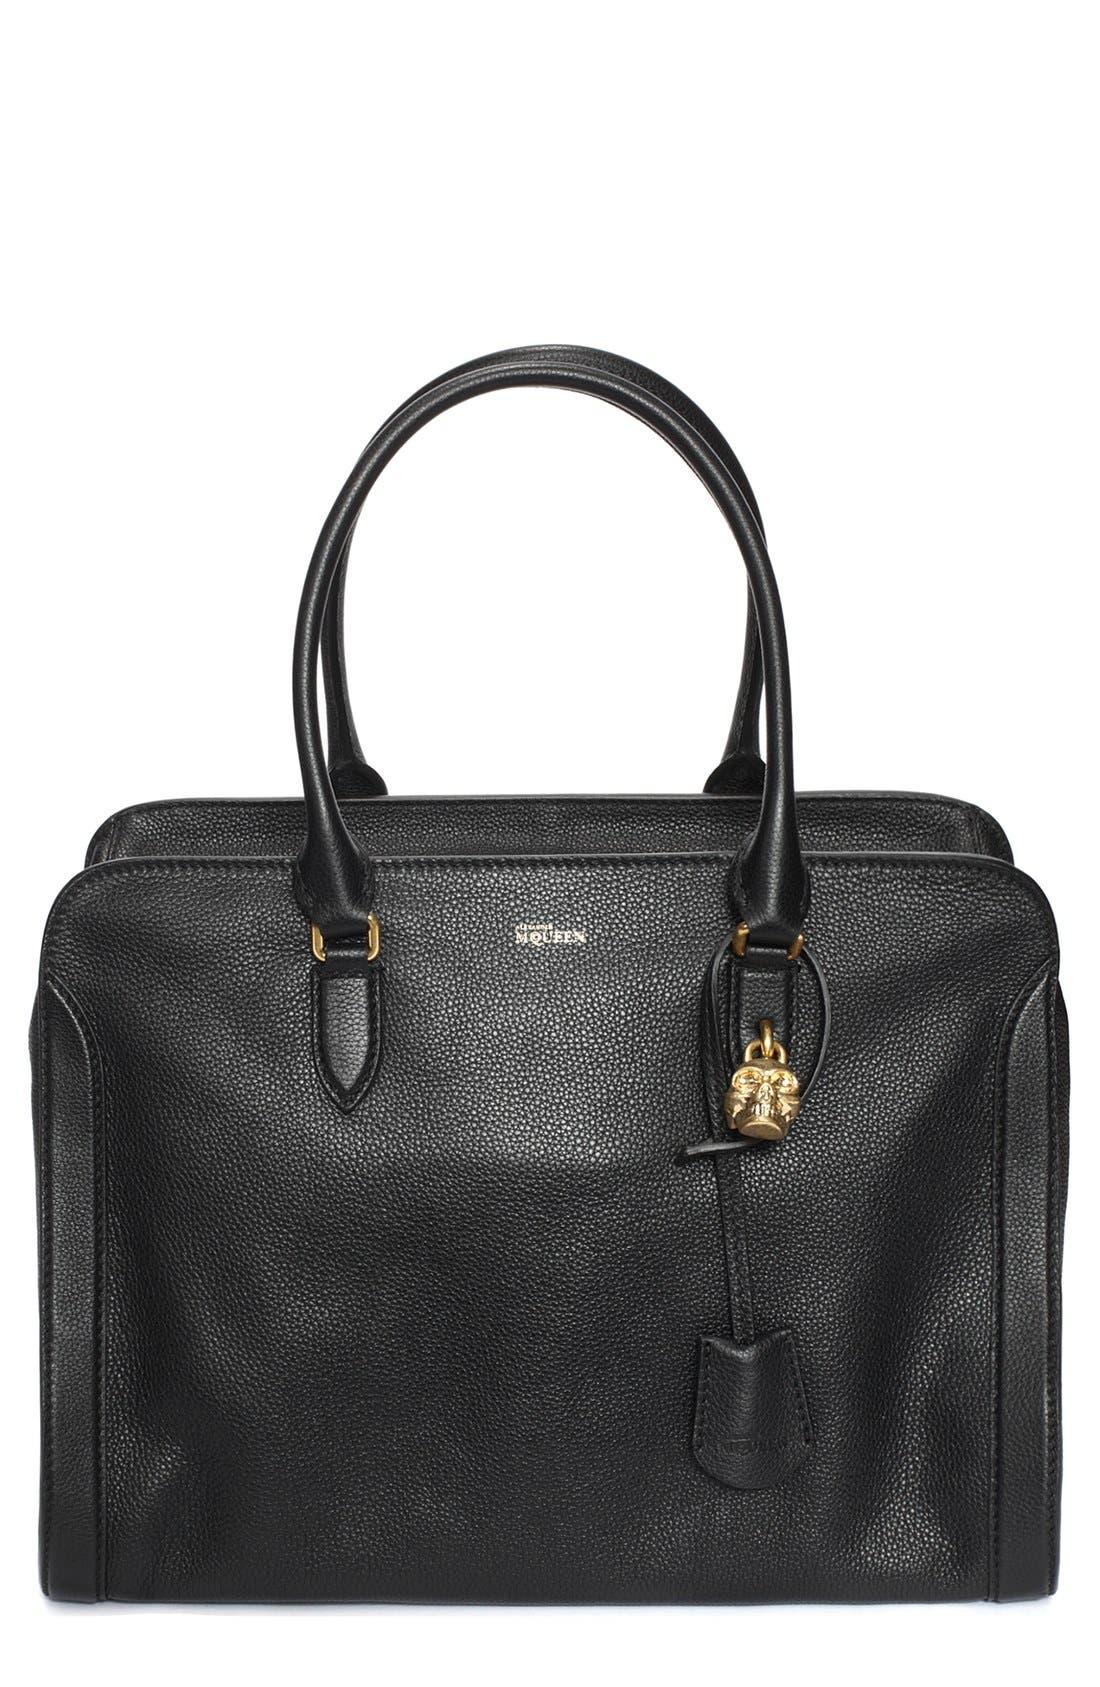 Alternate Image 1 Selected - Alexander McQueen 'Padlock' Calfskin Leather Duffel Bag